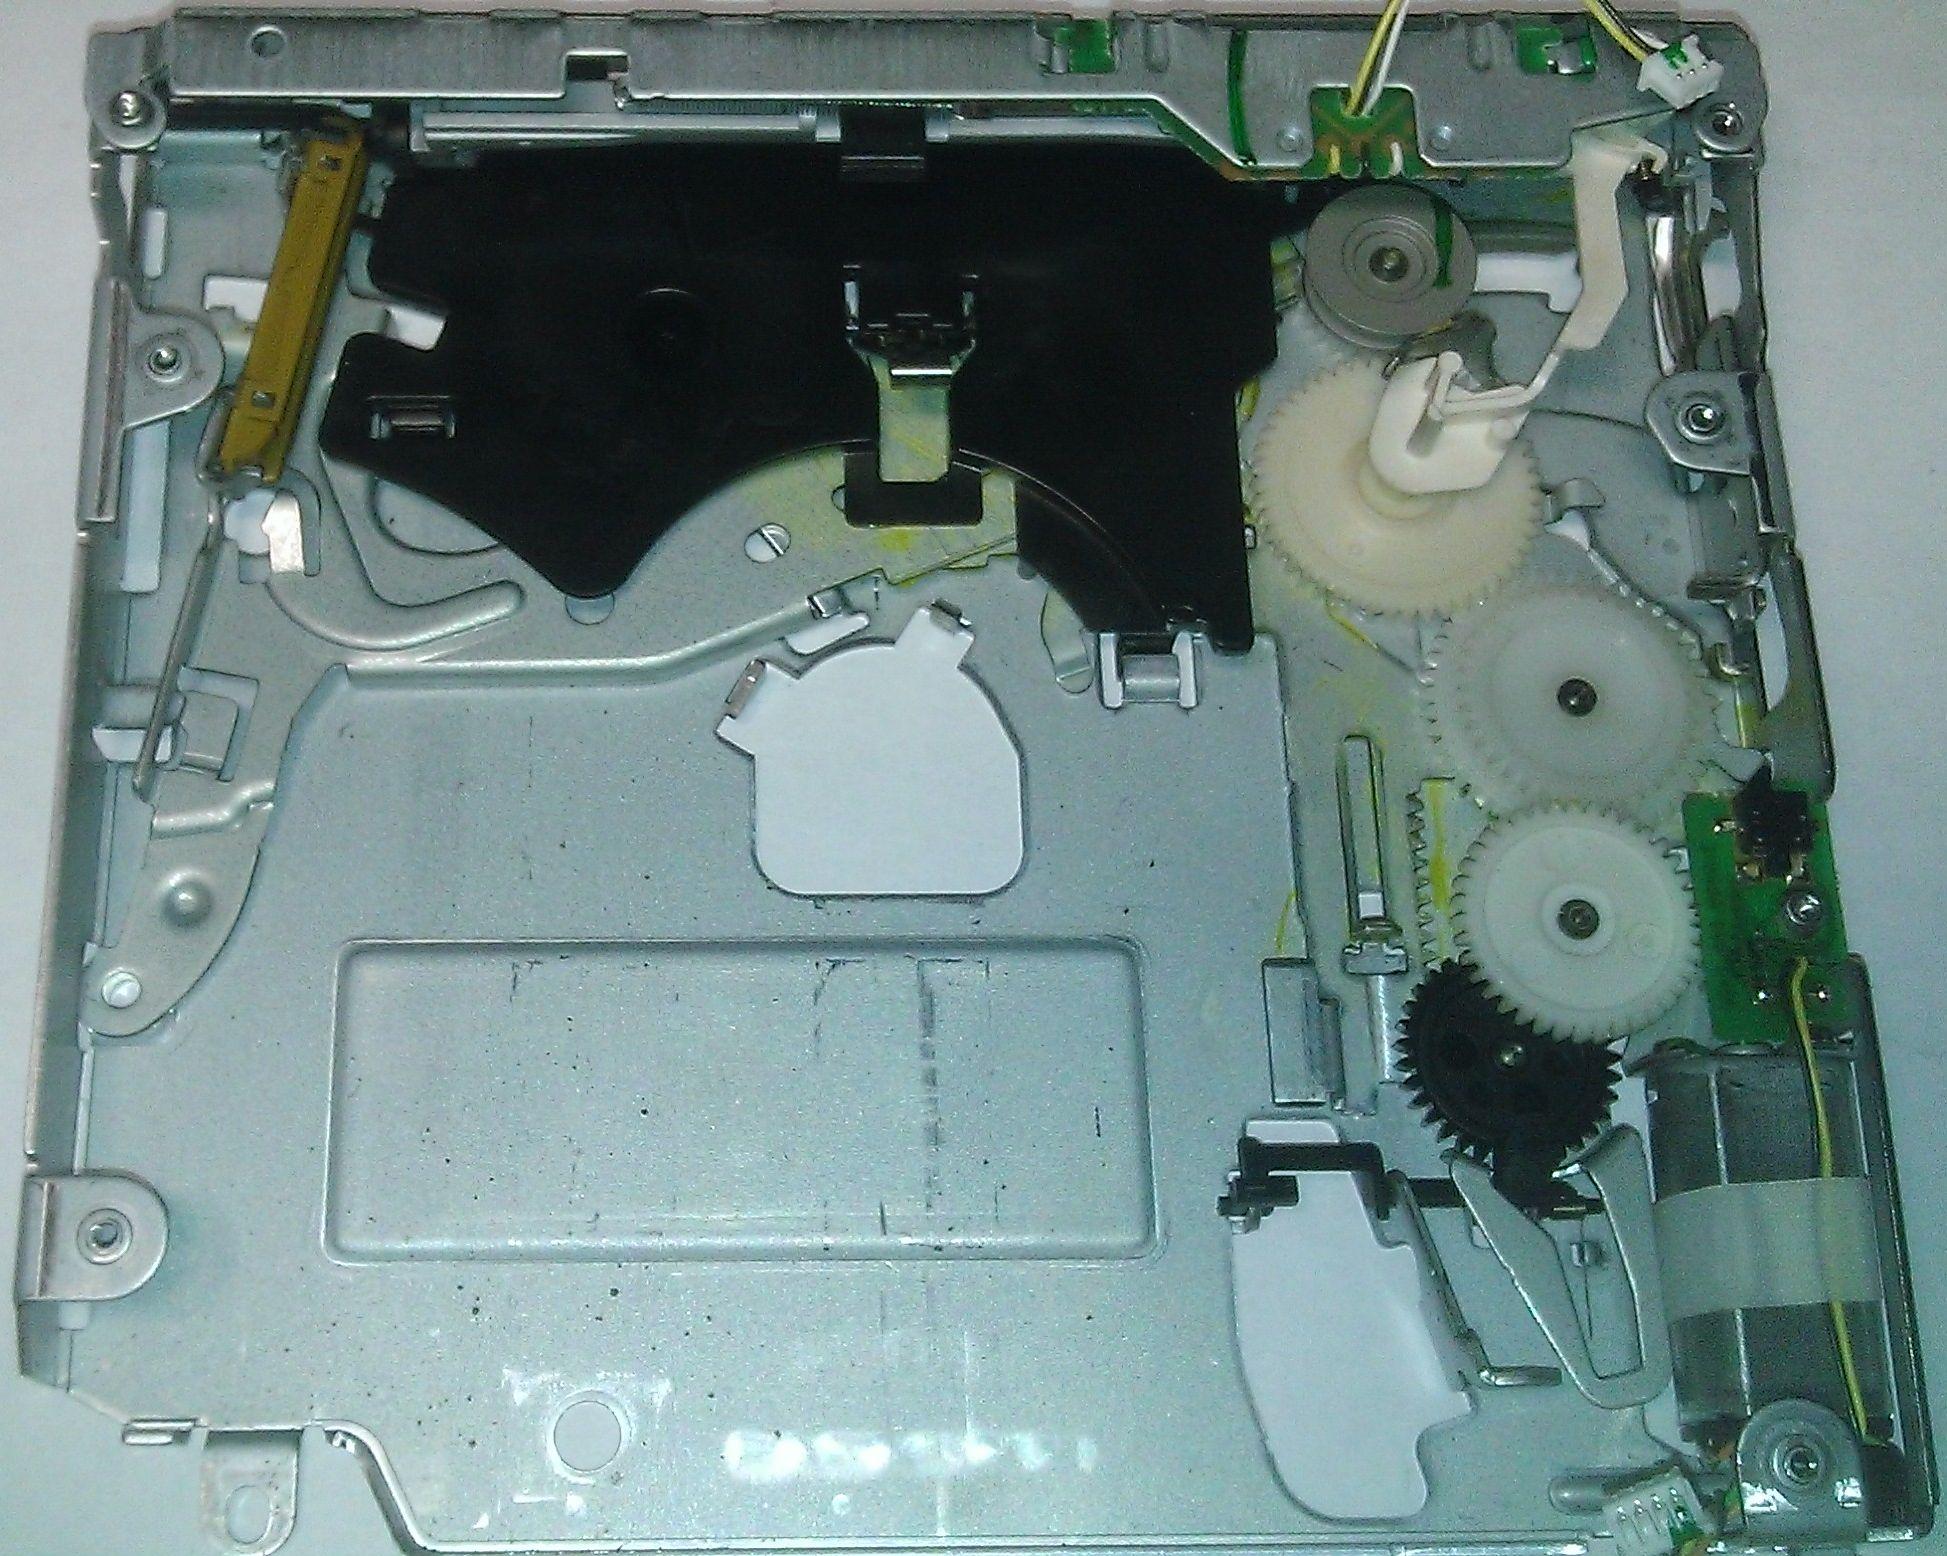 DVD M3.5 - механизм загрузки диска